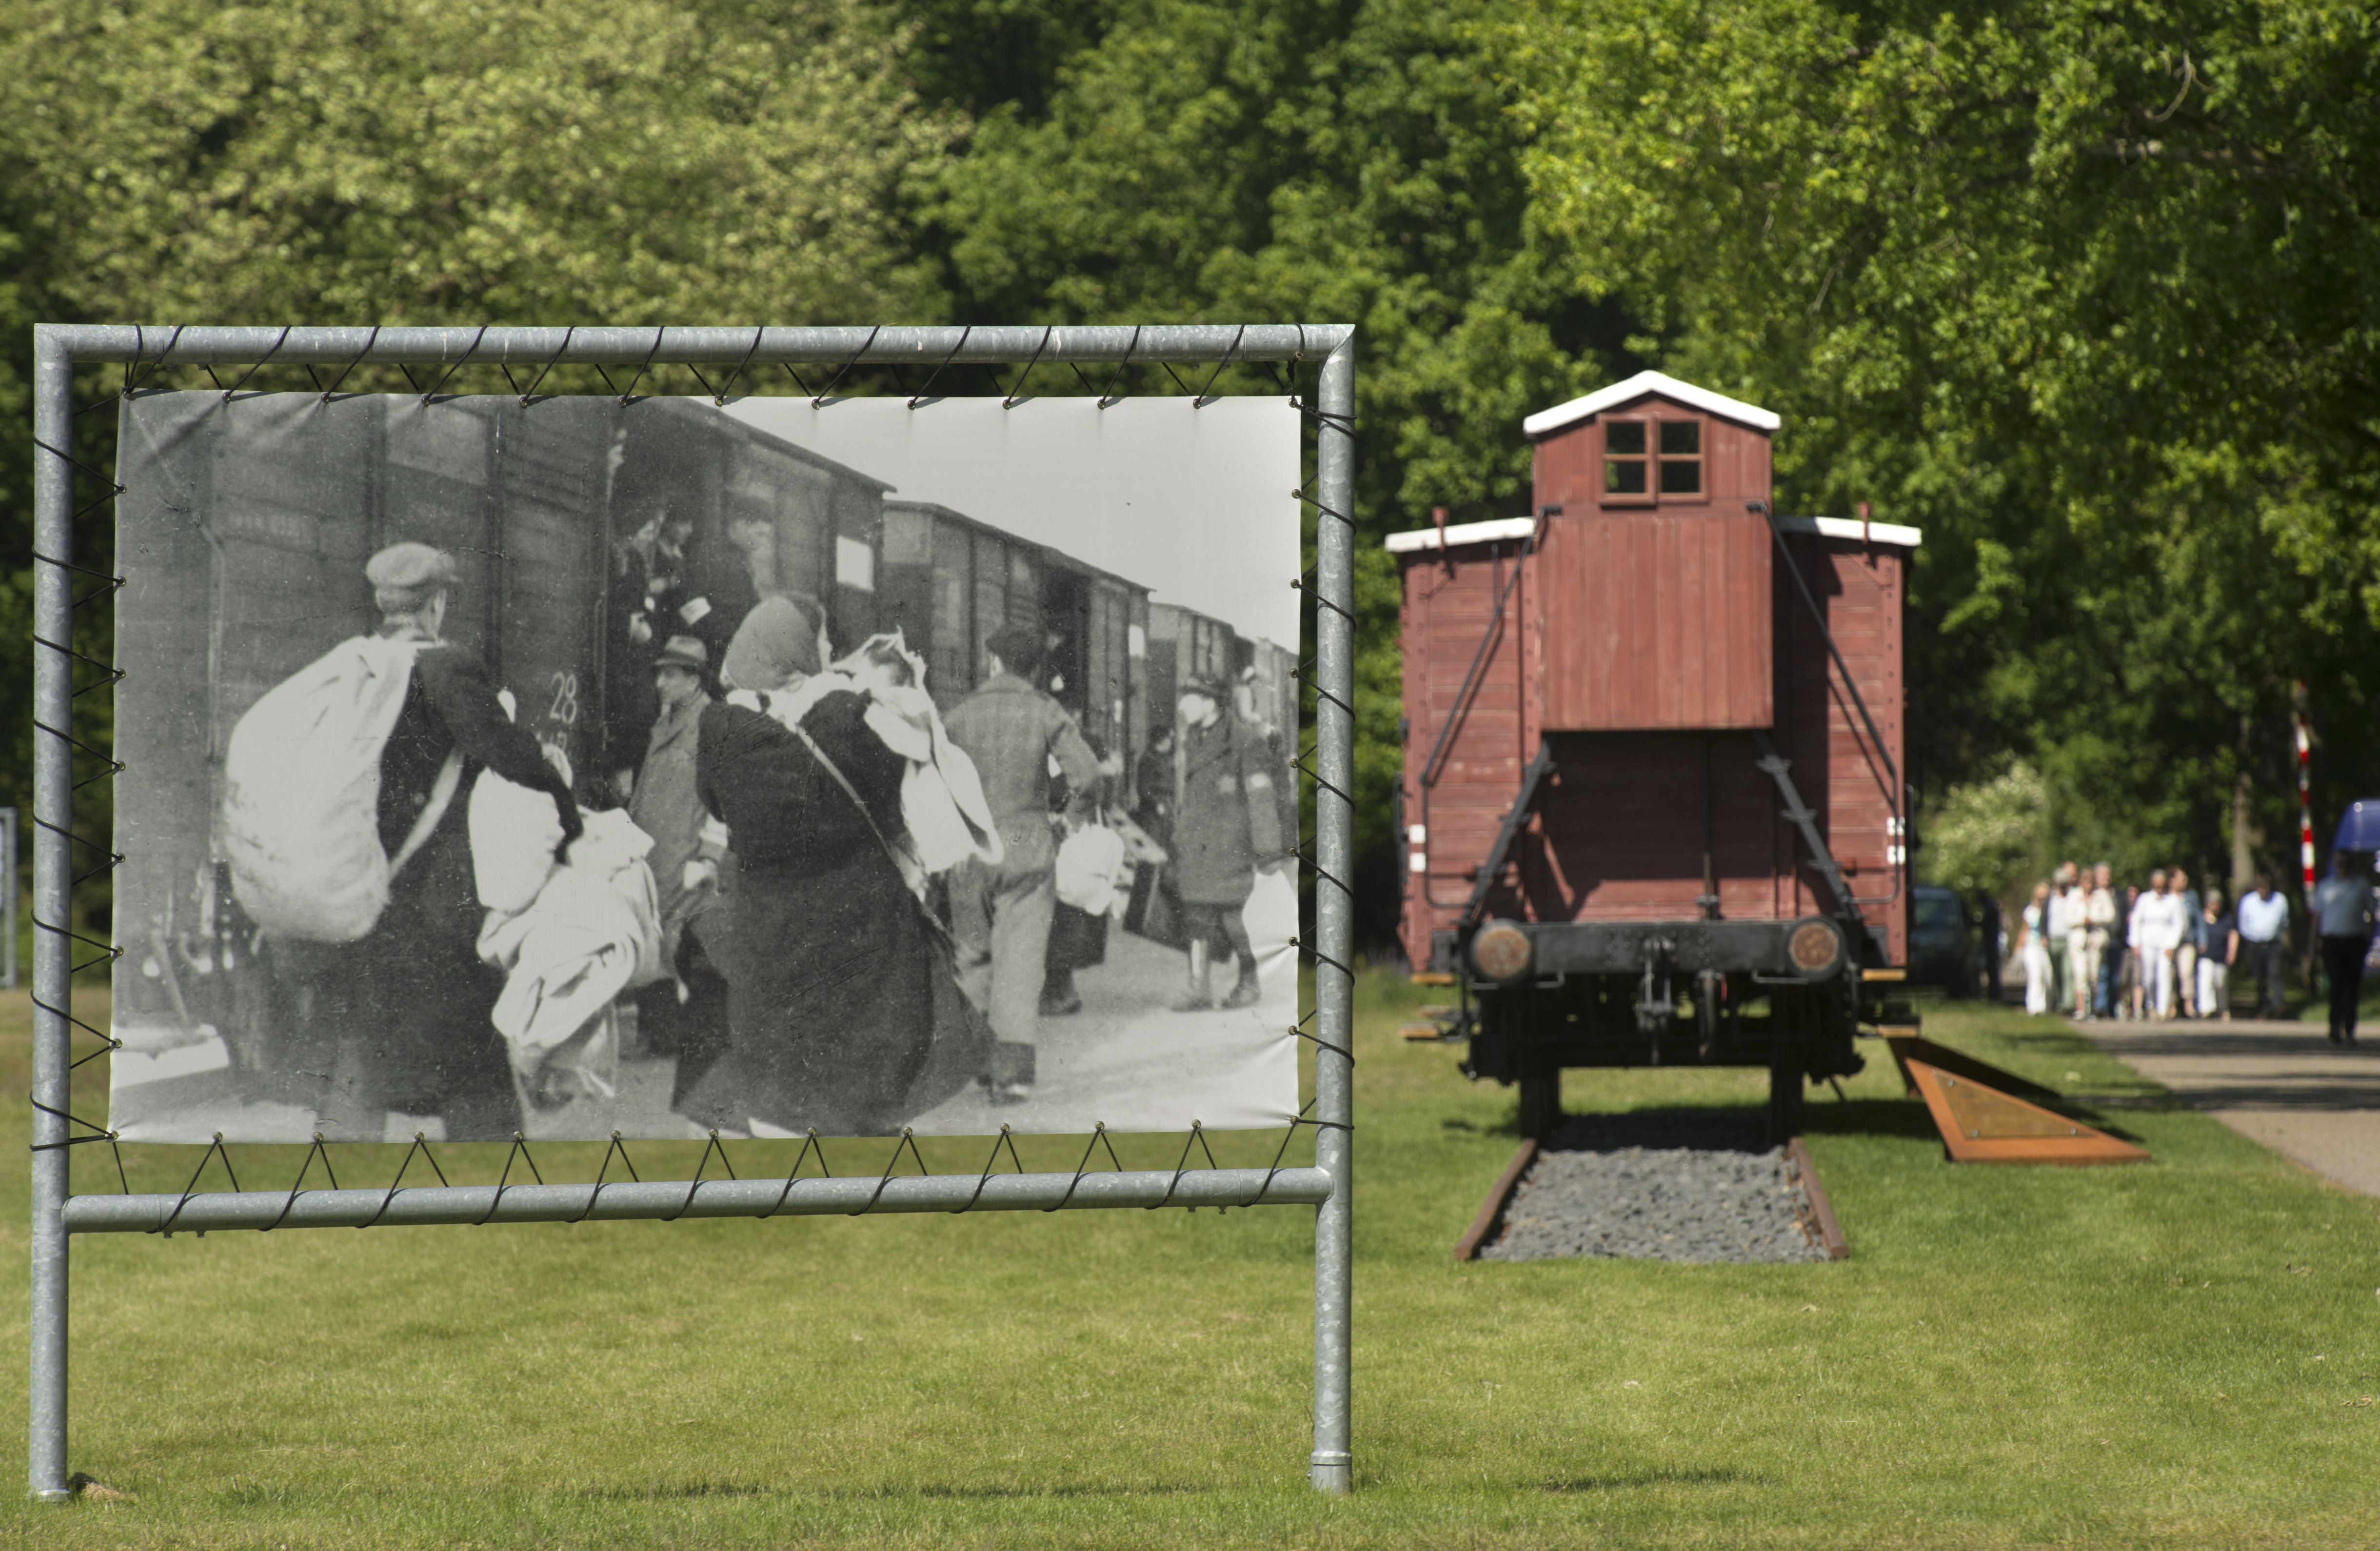 Nederland - Hooghalen - Drenthe - 11-06-2015 Herinneringscentrum kamp Westerbork. Foto: Sake Elzinga